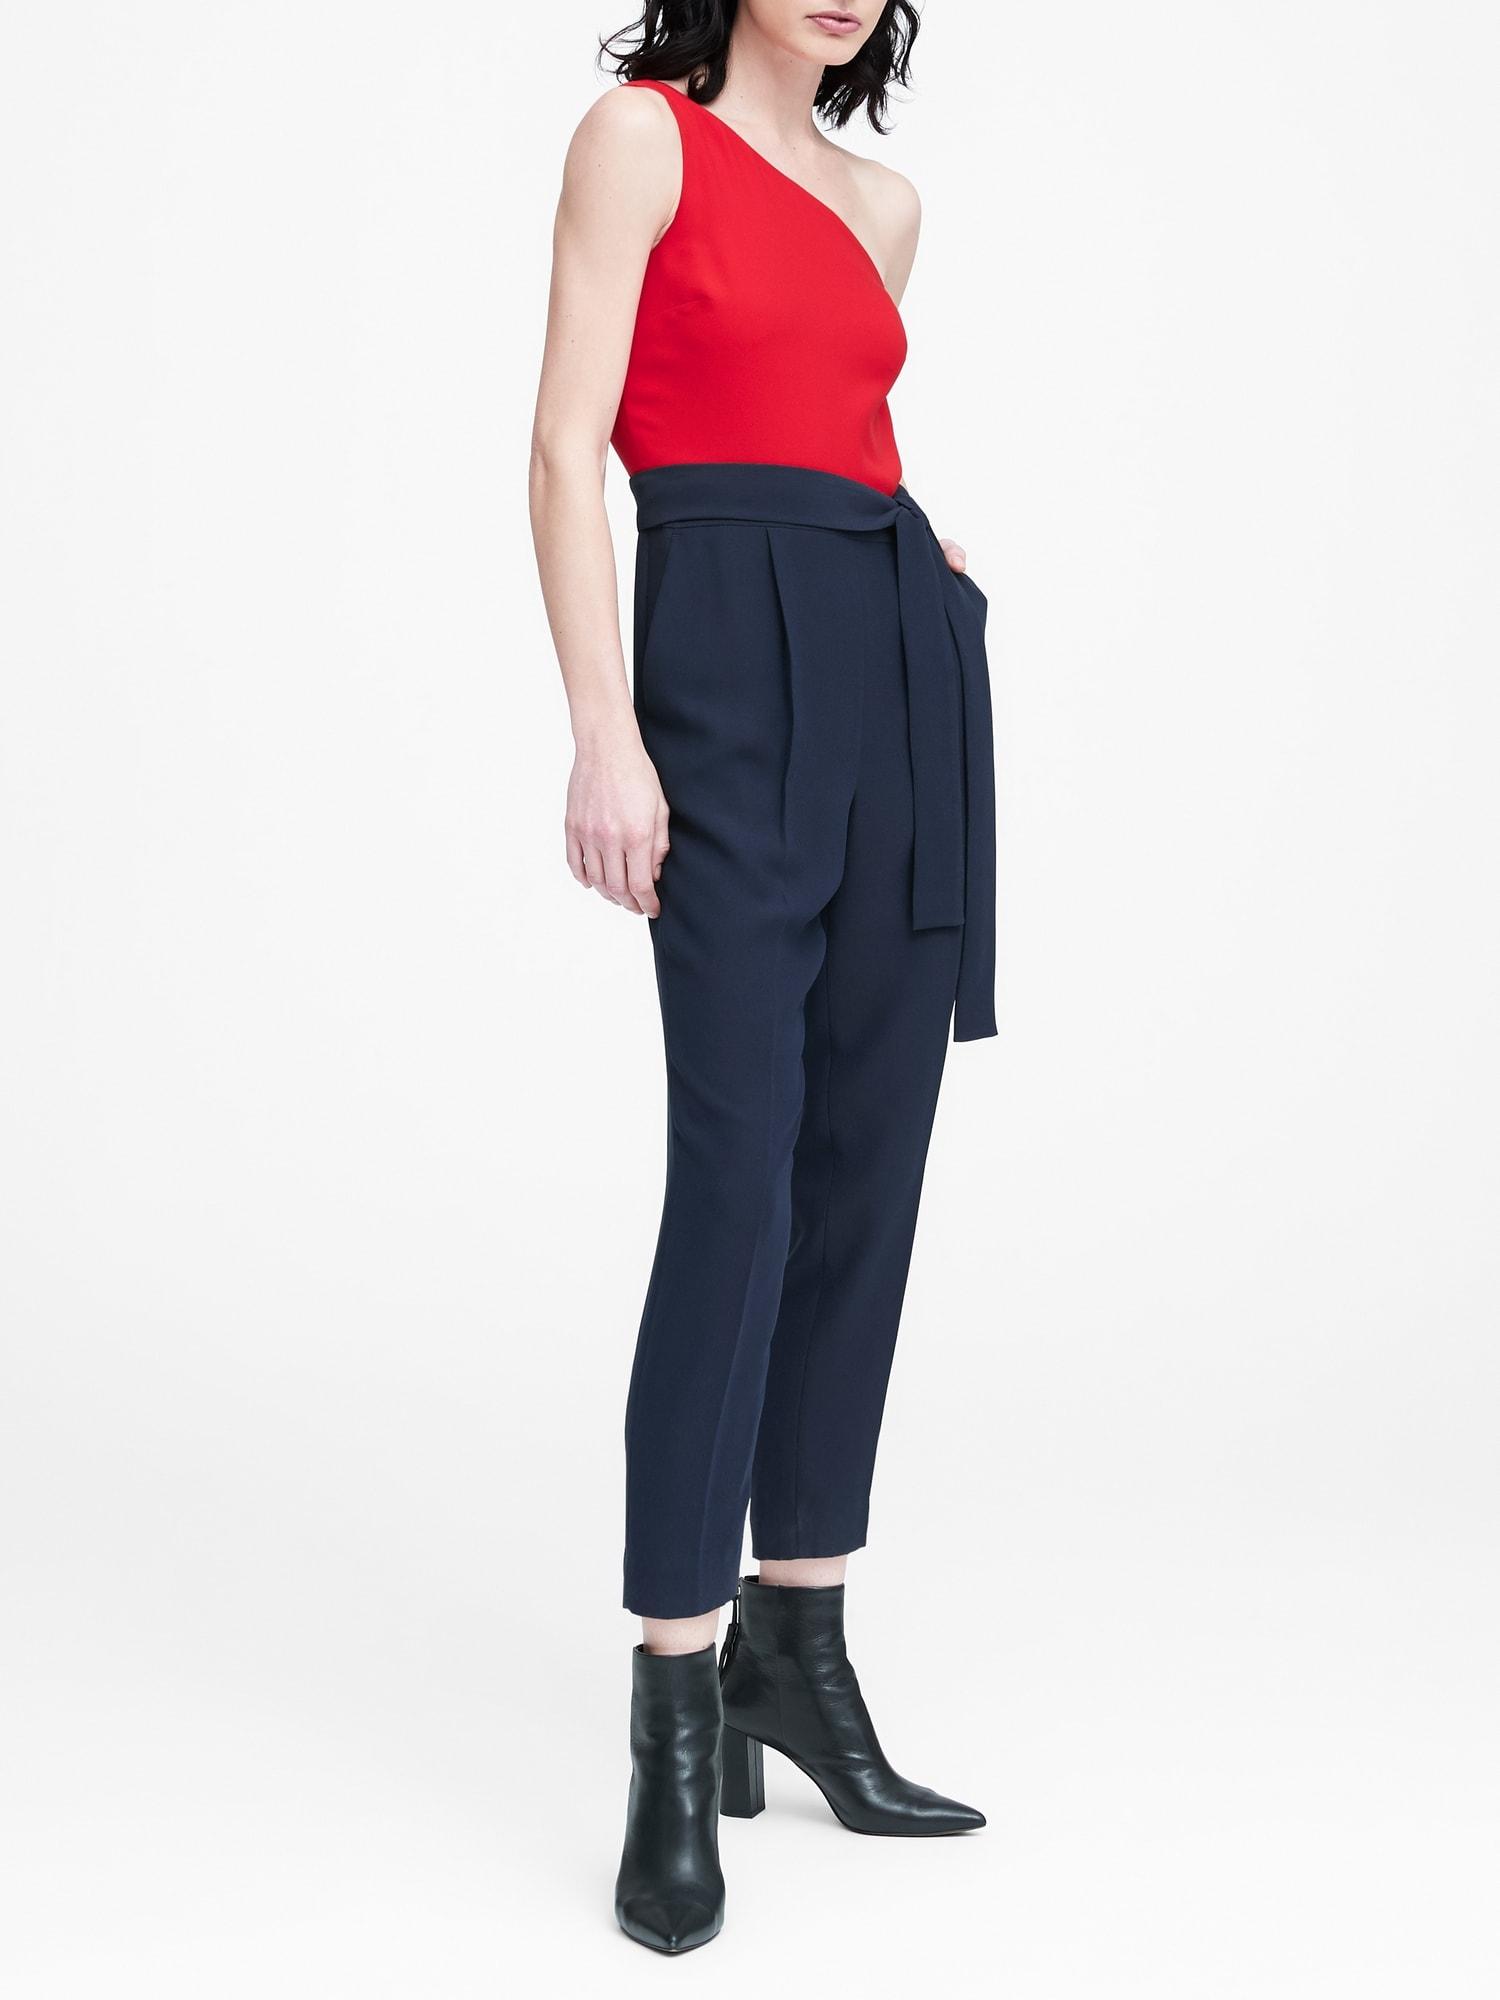 feeee0691f72 One-Shoulder Jumpsuit